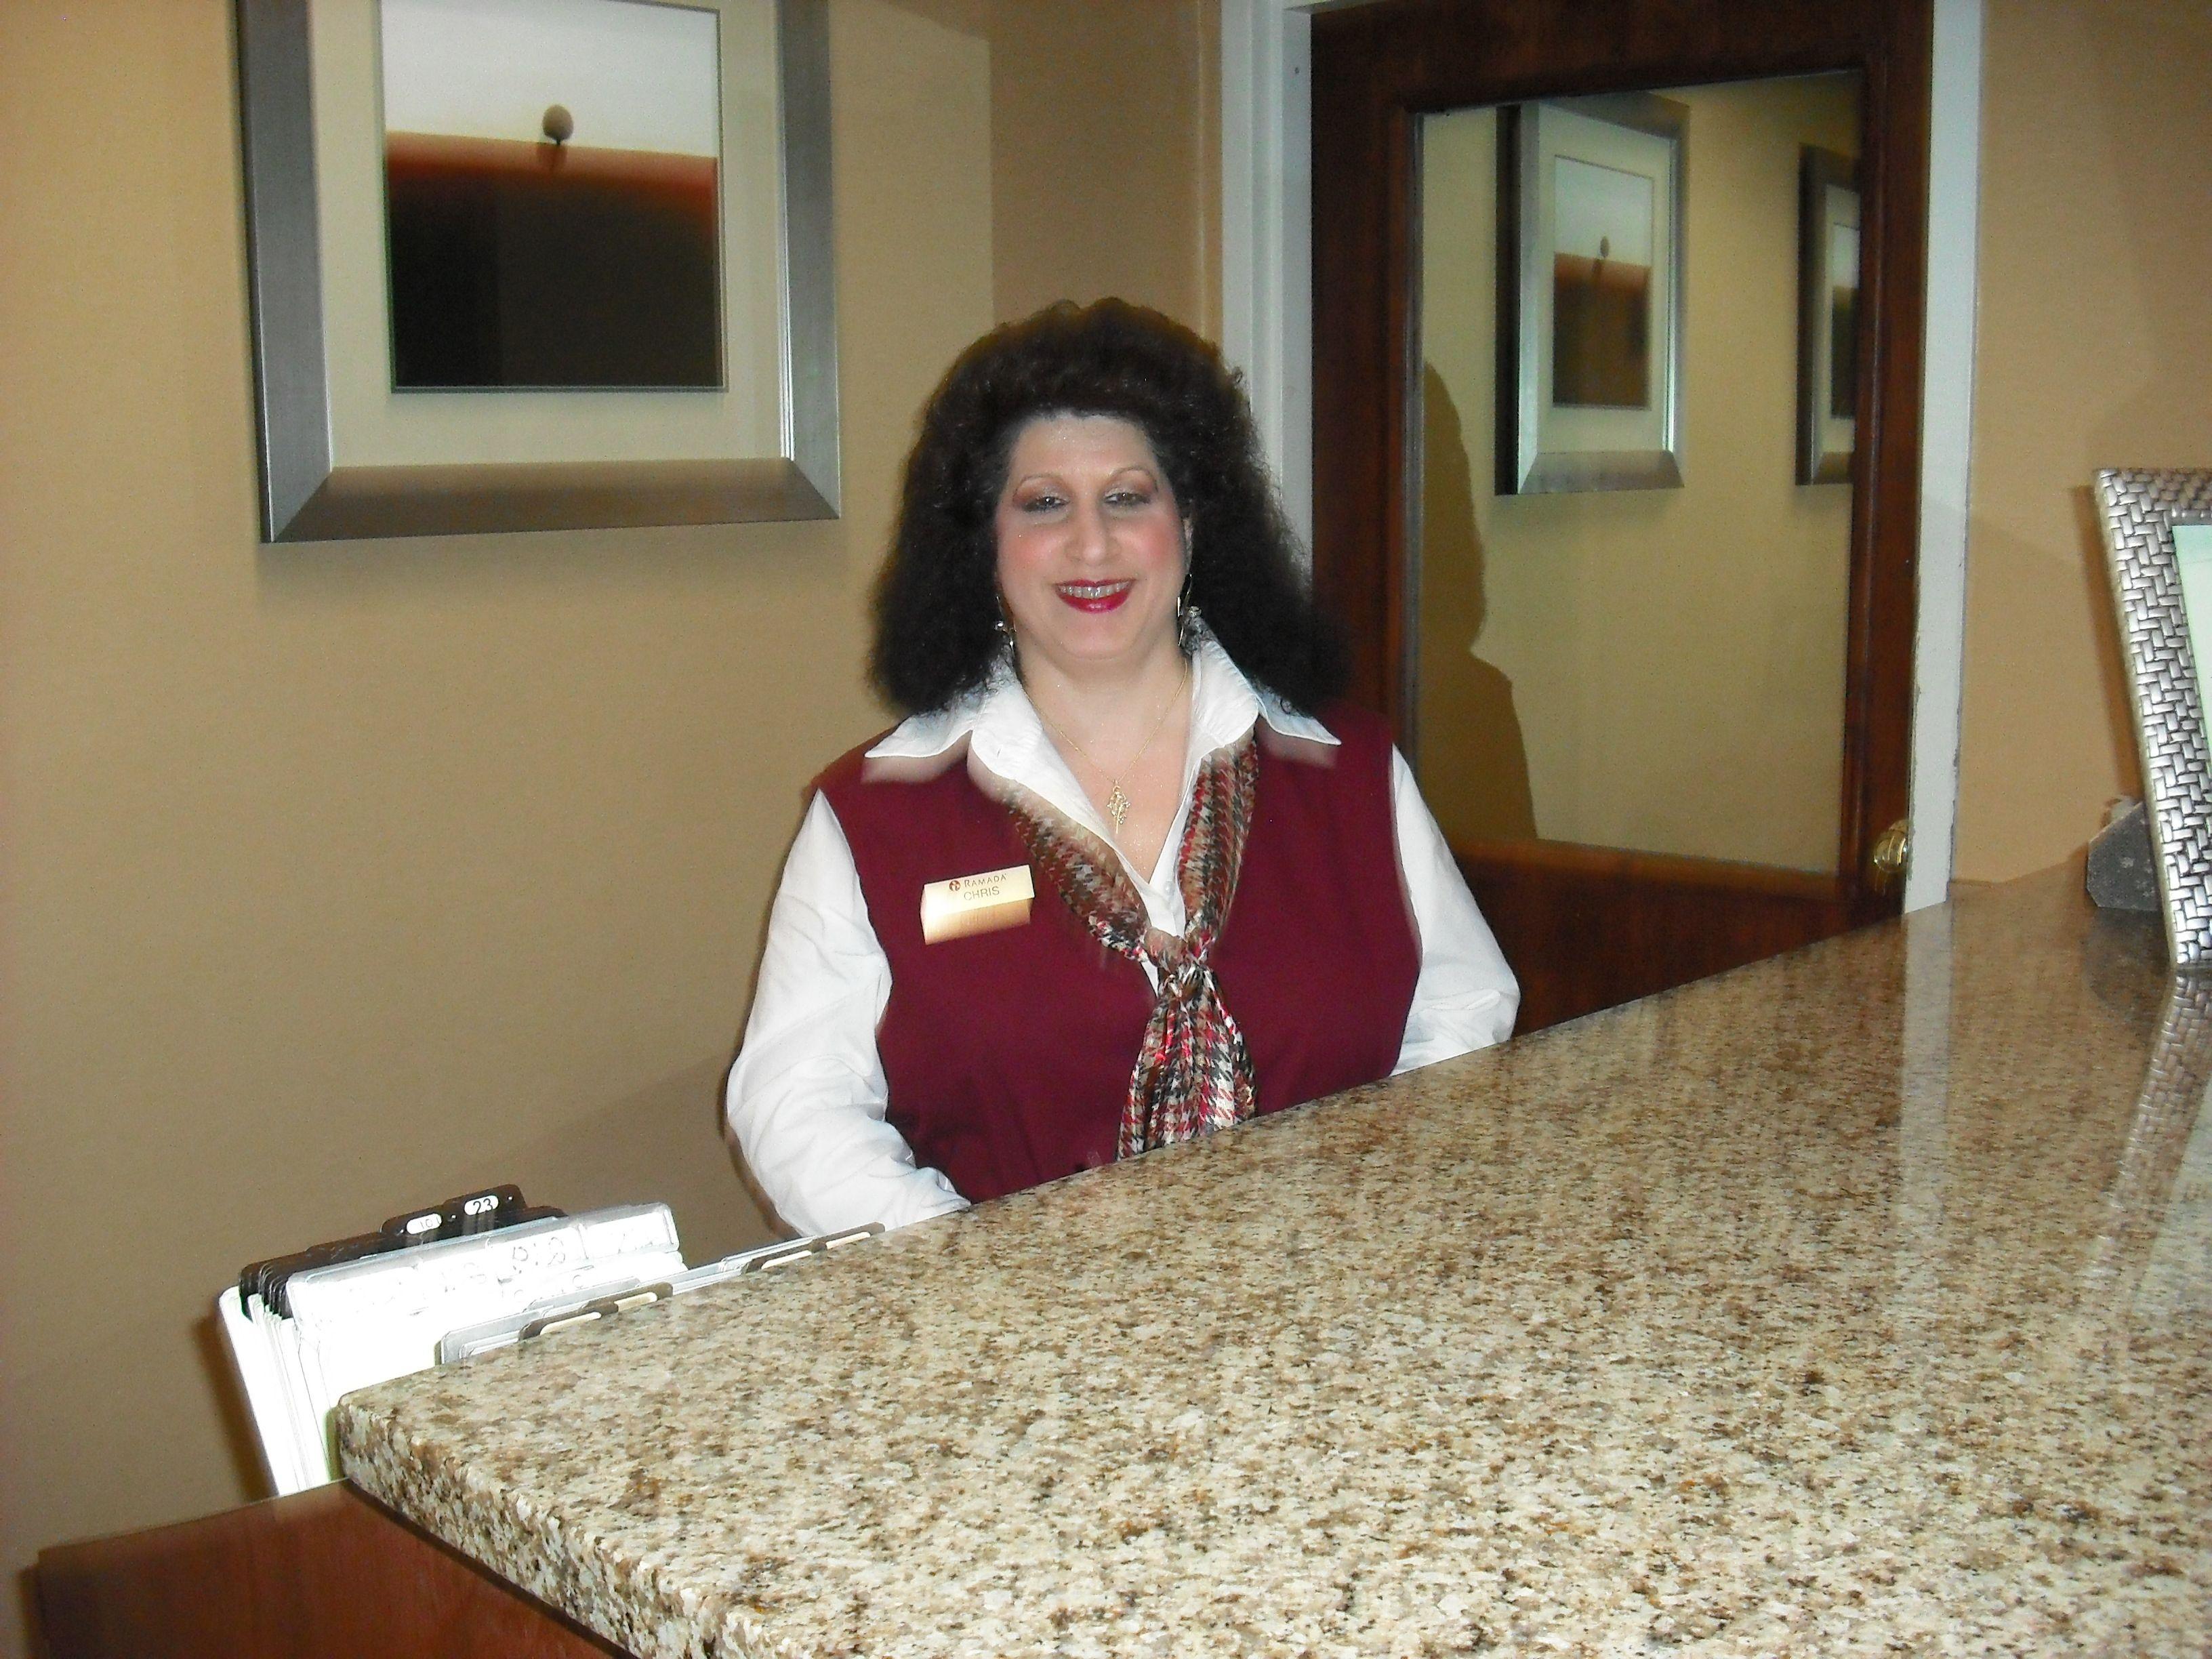 The Friendliest Hotel Front Desk Clerk At The Fast Inn In Goness France Front Desk Friendly Hotel